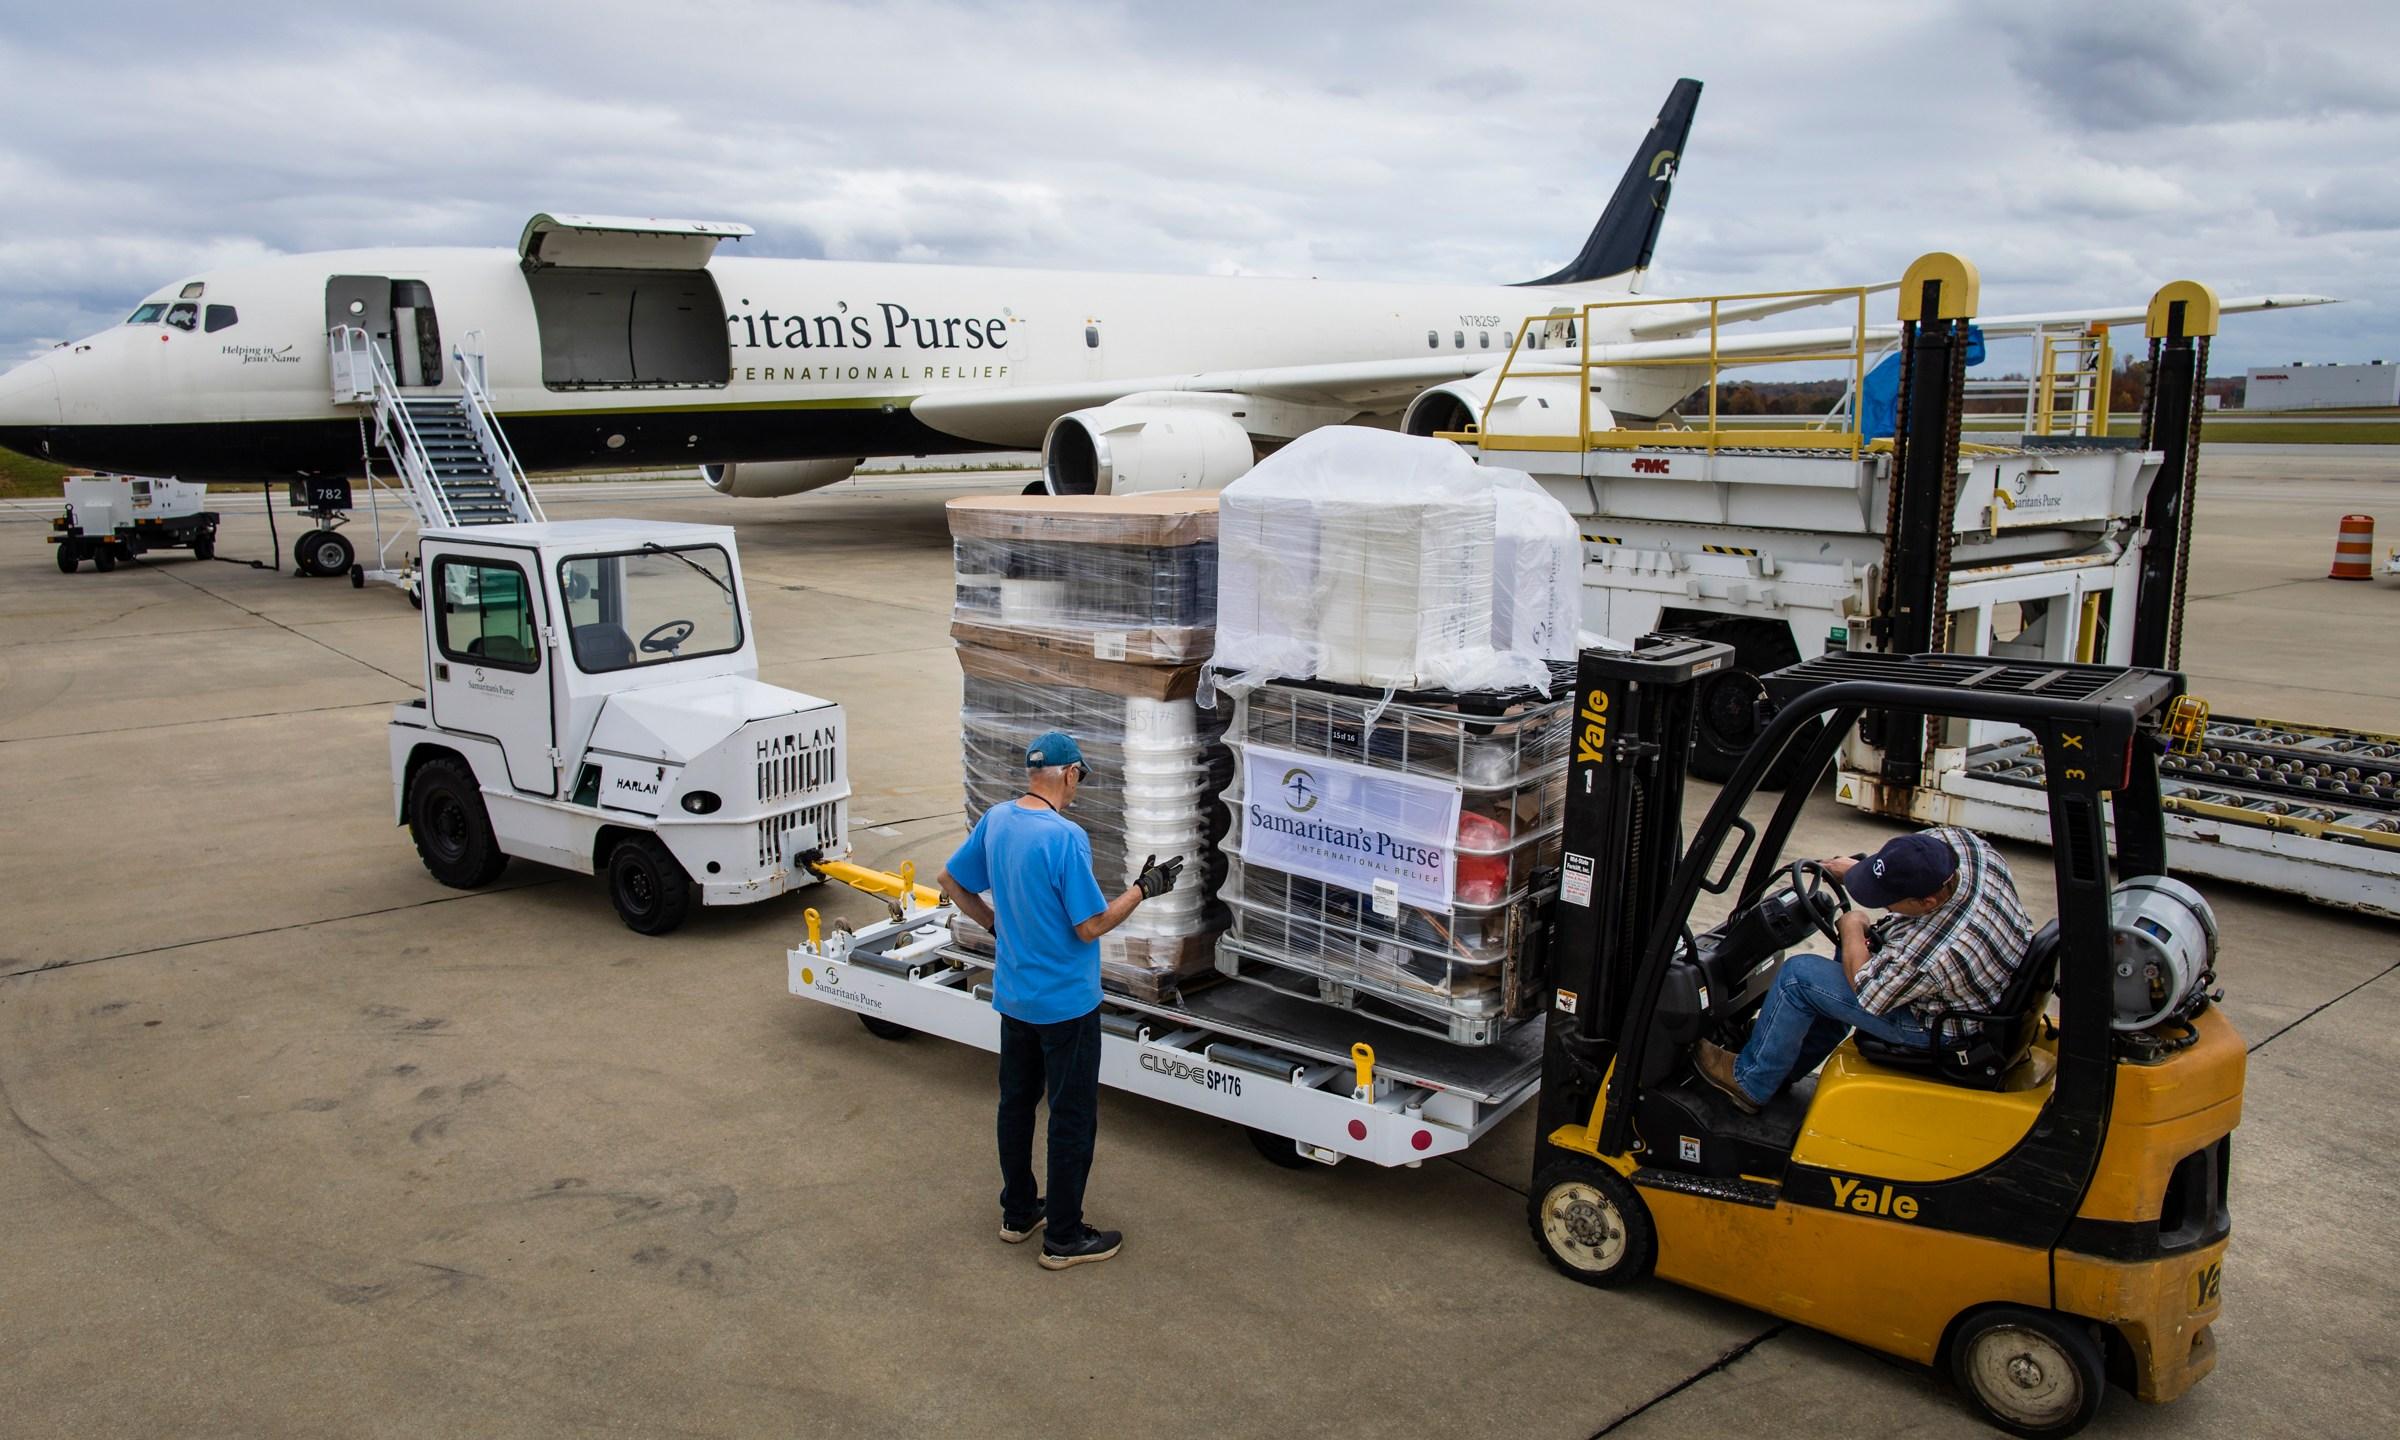 Boone-based Samaritan's Purse to fly to Honduras after Hurricane Eta left trail of destruction (Courtesy of Samaritan's Purse)